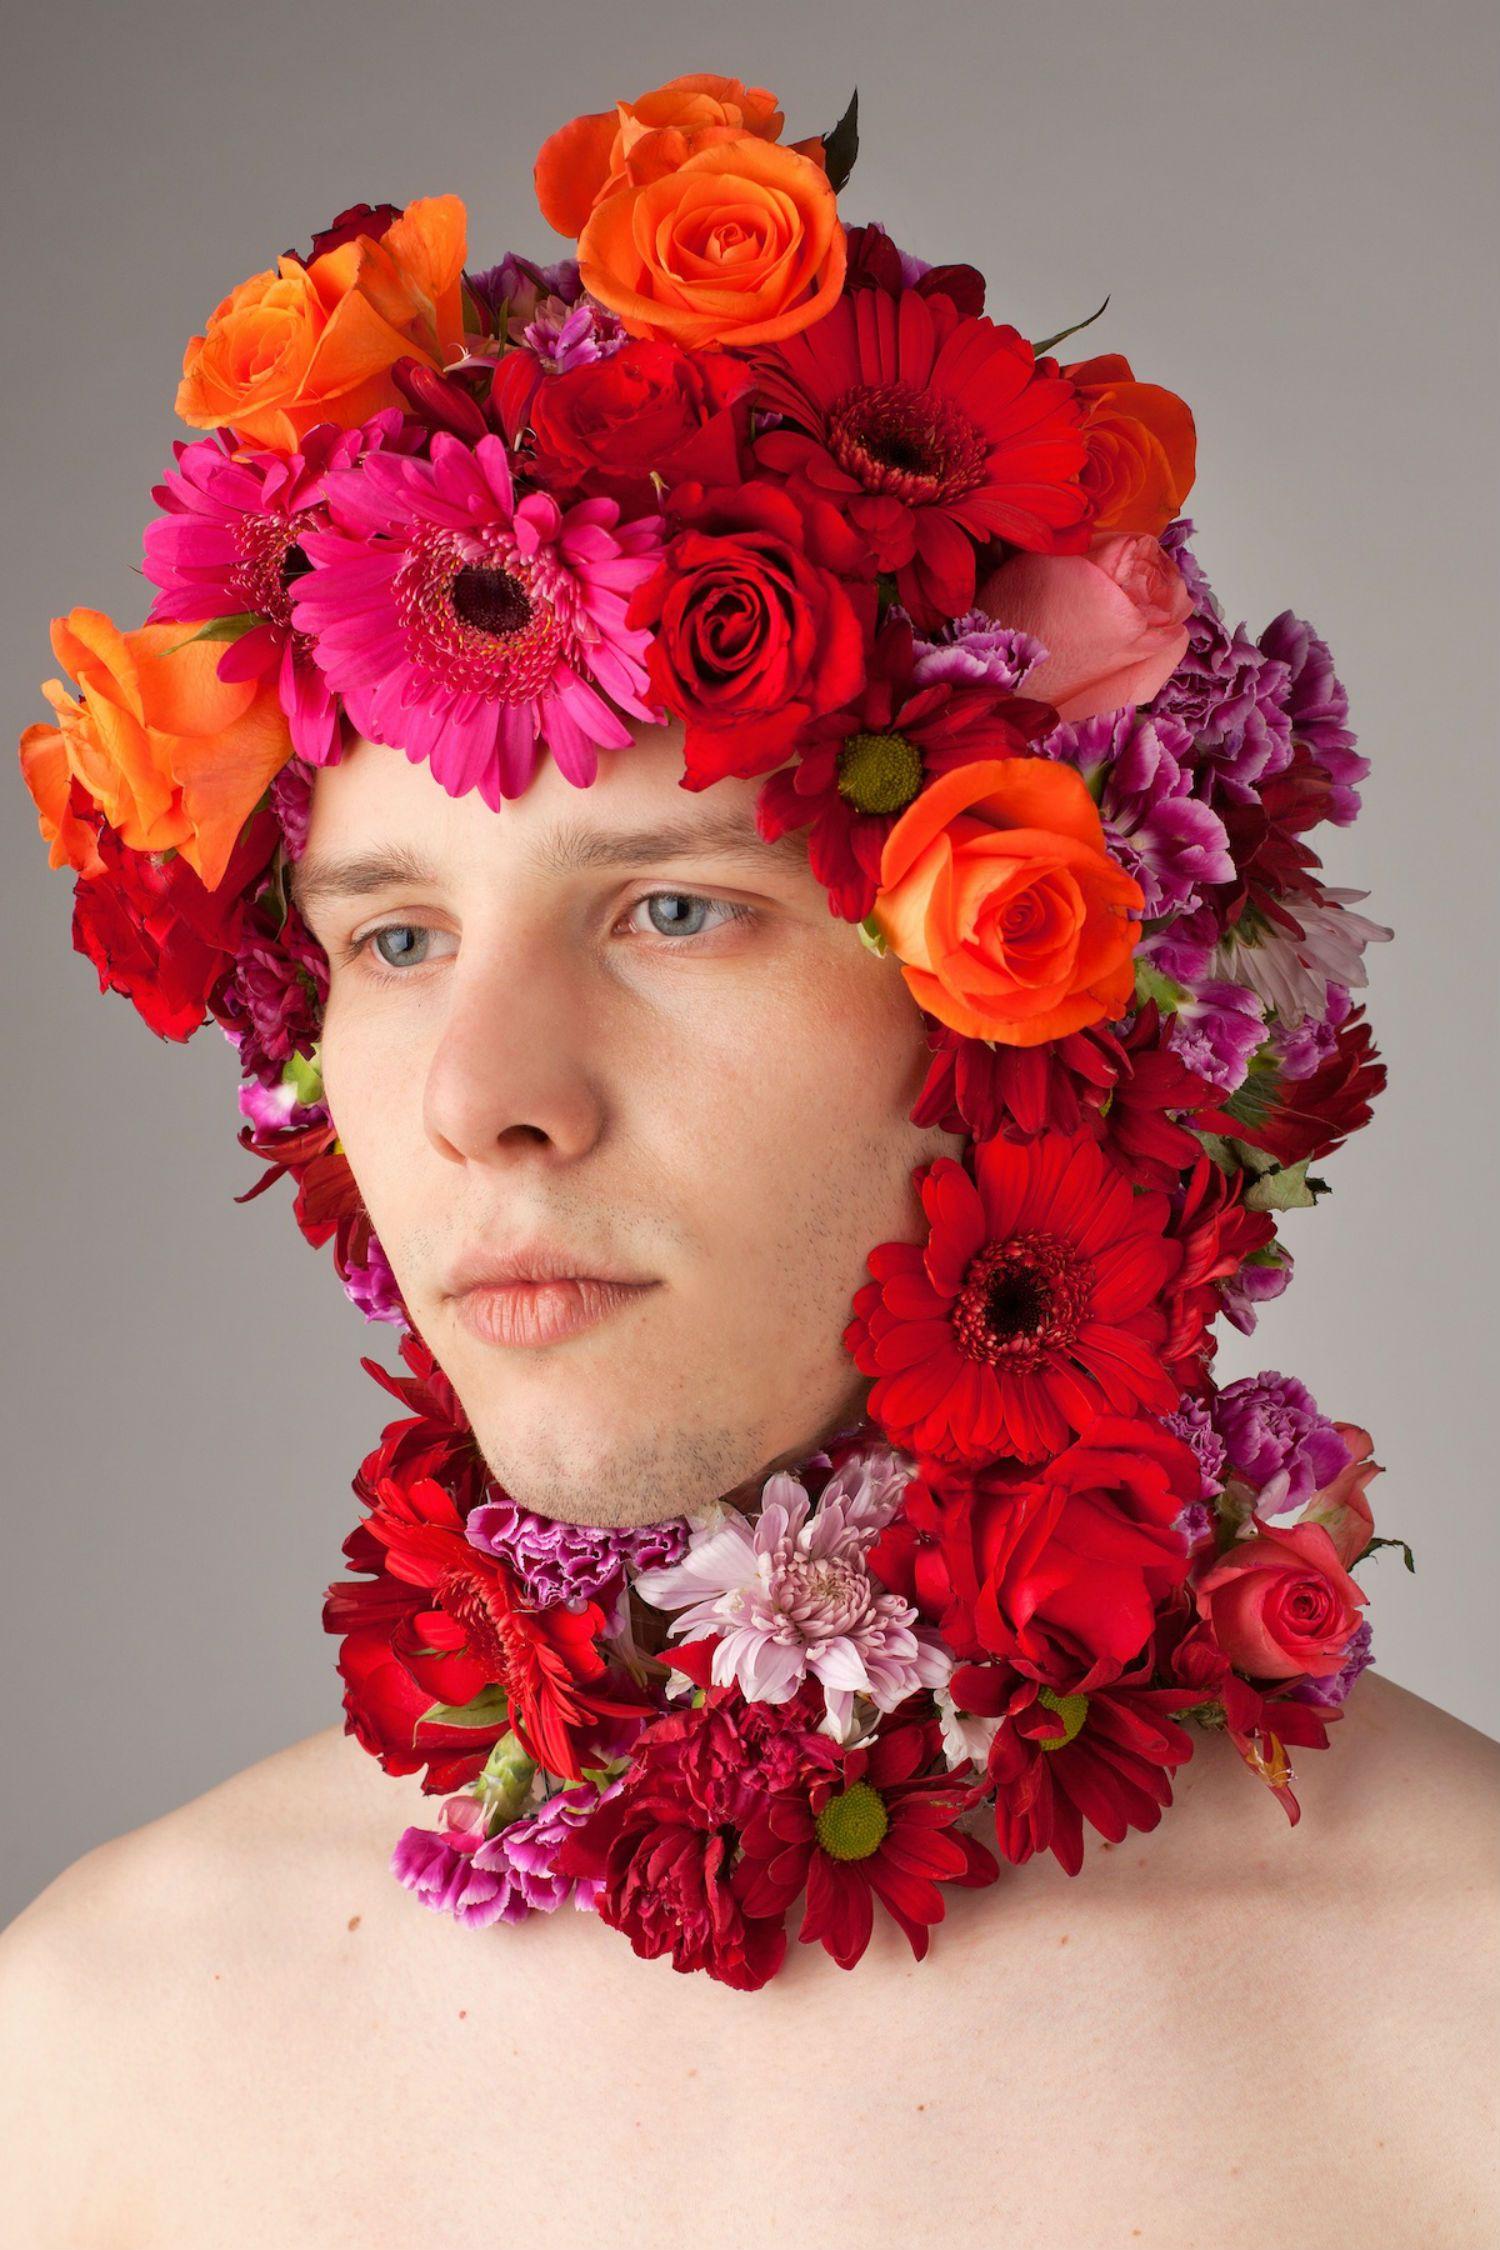 Boys flowers photography by aleksandra kingo blossom